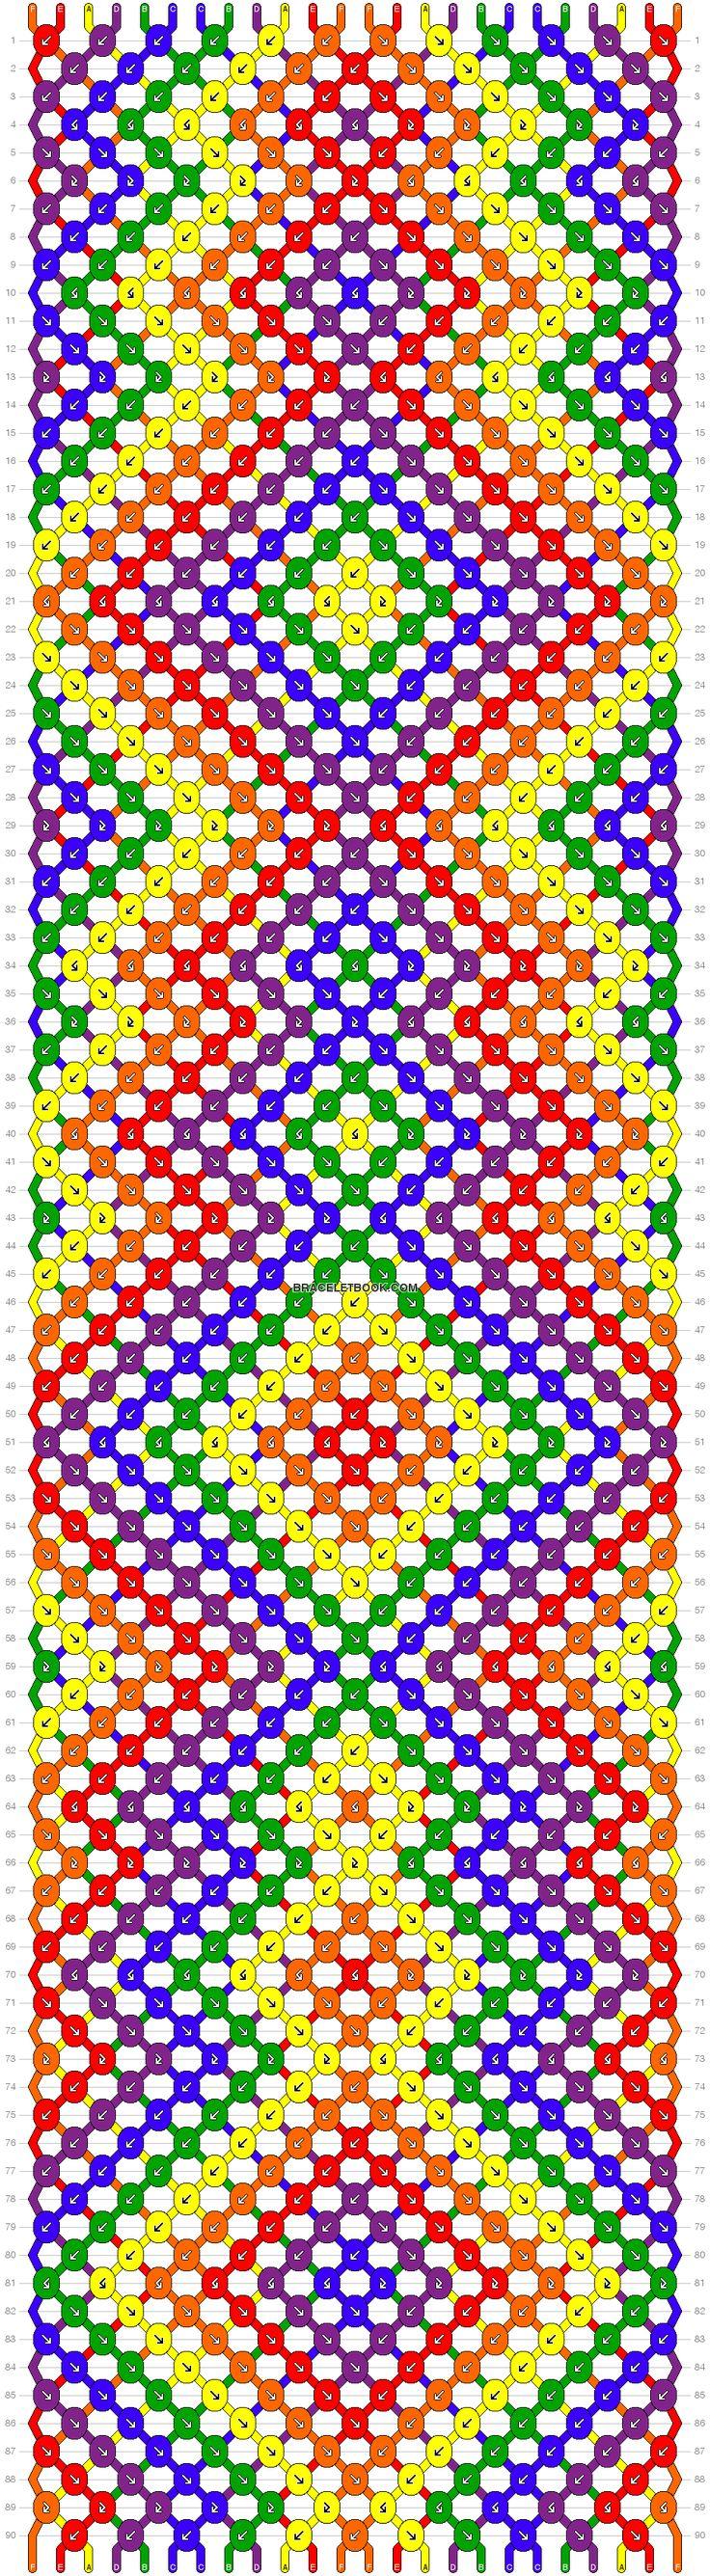 Normal Pattern #8184 added by GpailKids